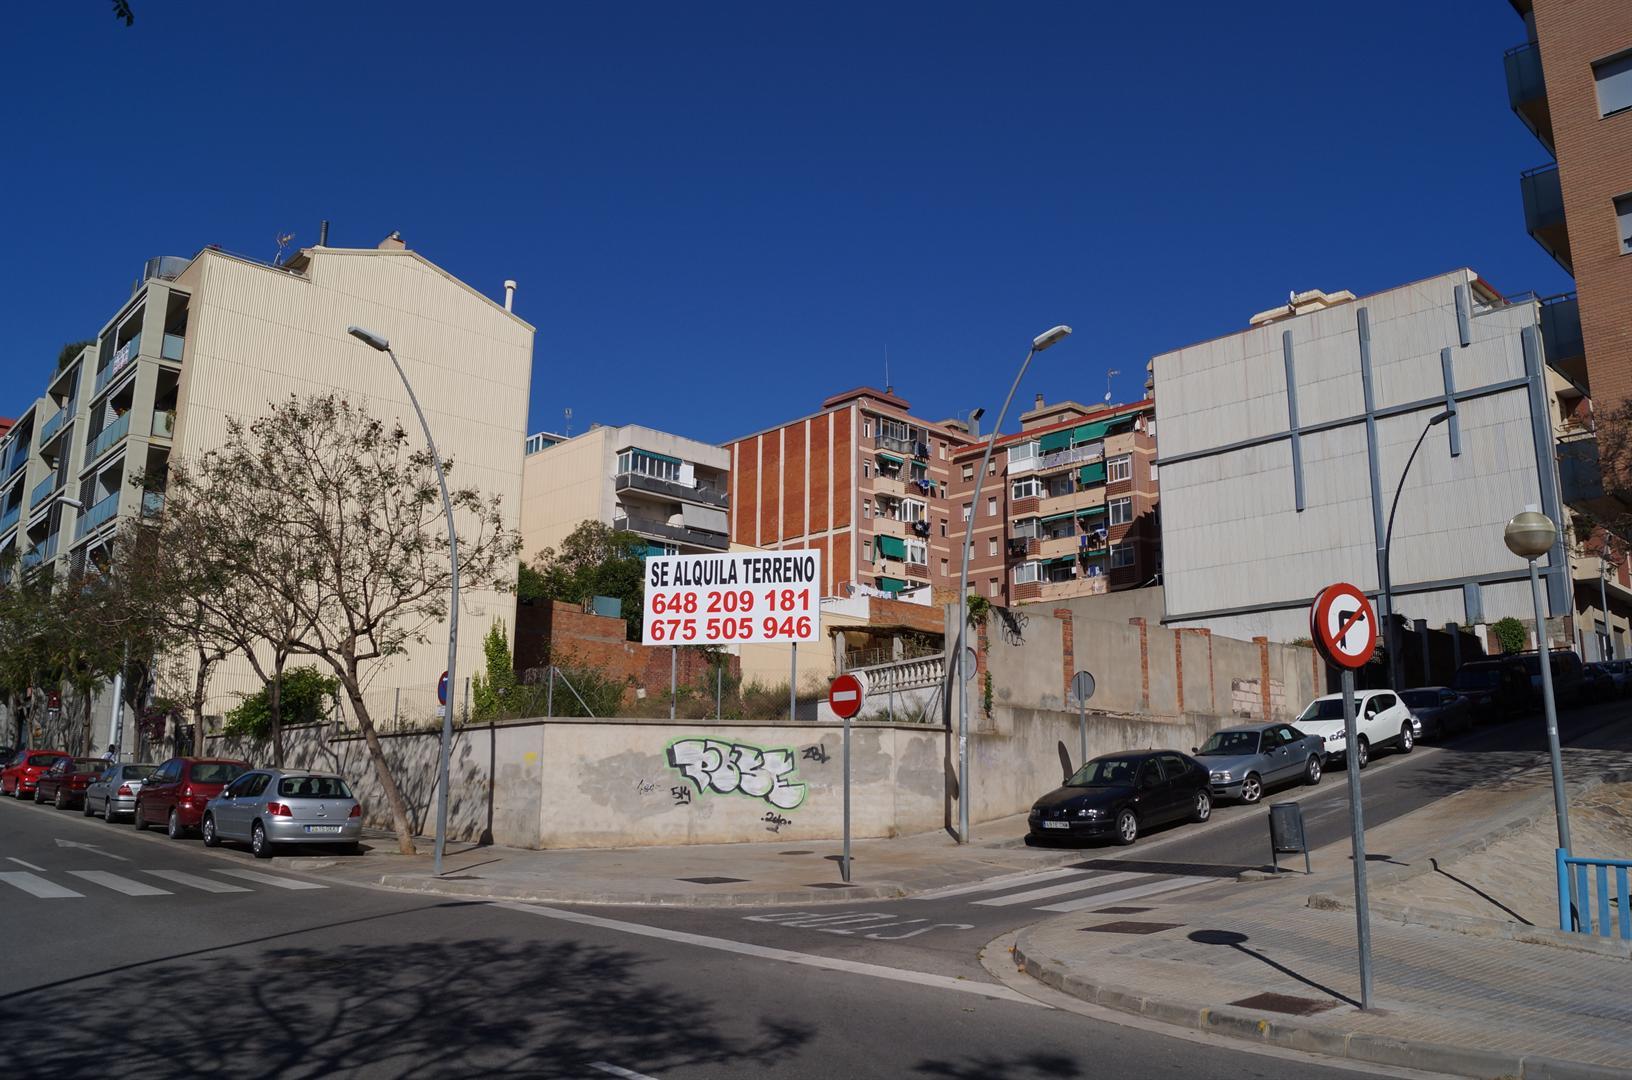 Terreno Residencial en venta en Vinyets - Molí Vell